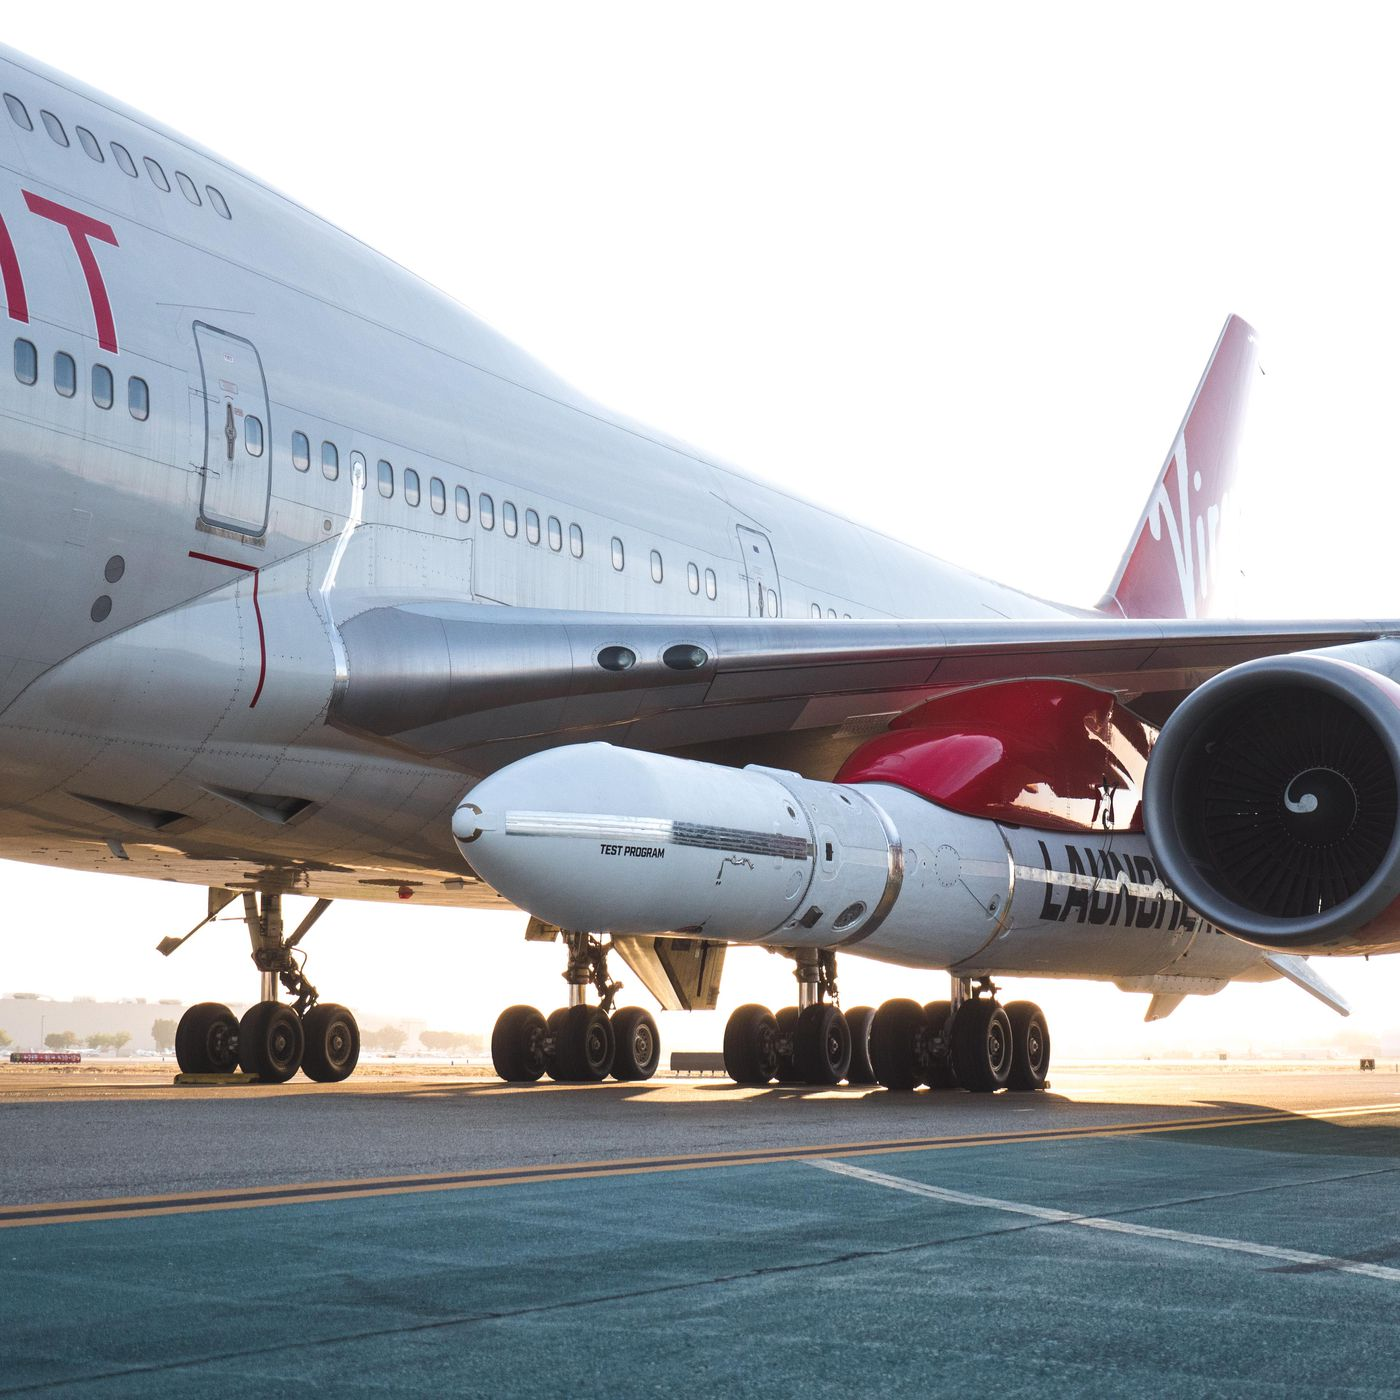 Virgin Orbit's LauncherOne: photos show the rocket attached